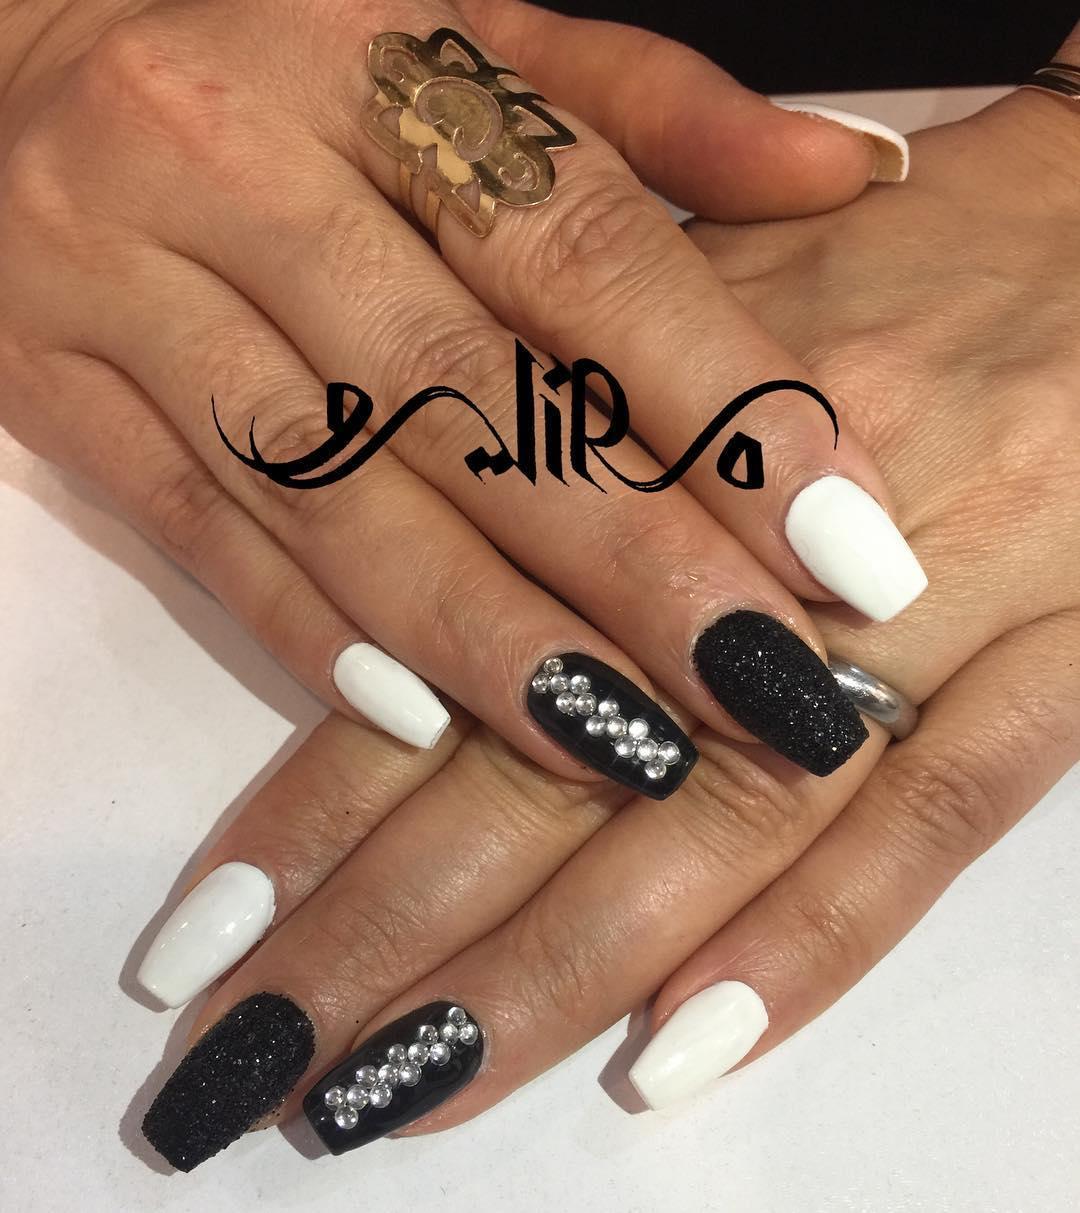 incredible black and white nail designs 15 - 16 Incredible Black and White Nail Designs